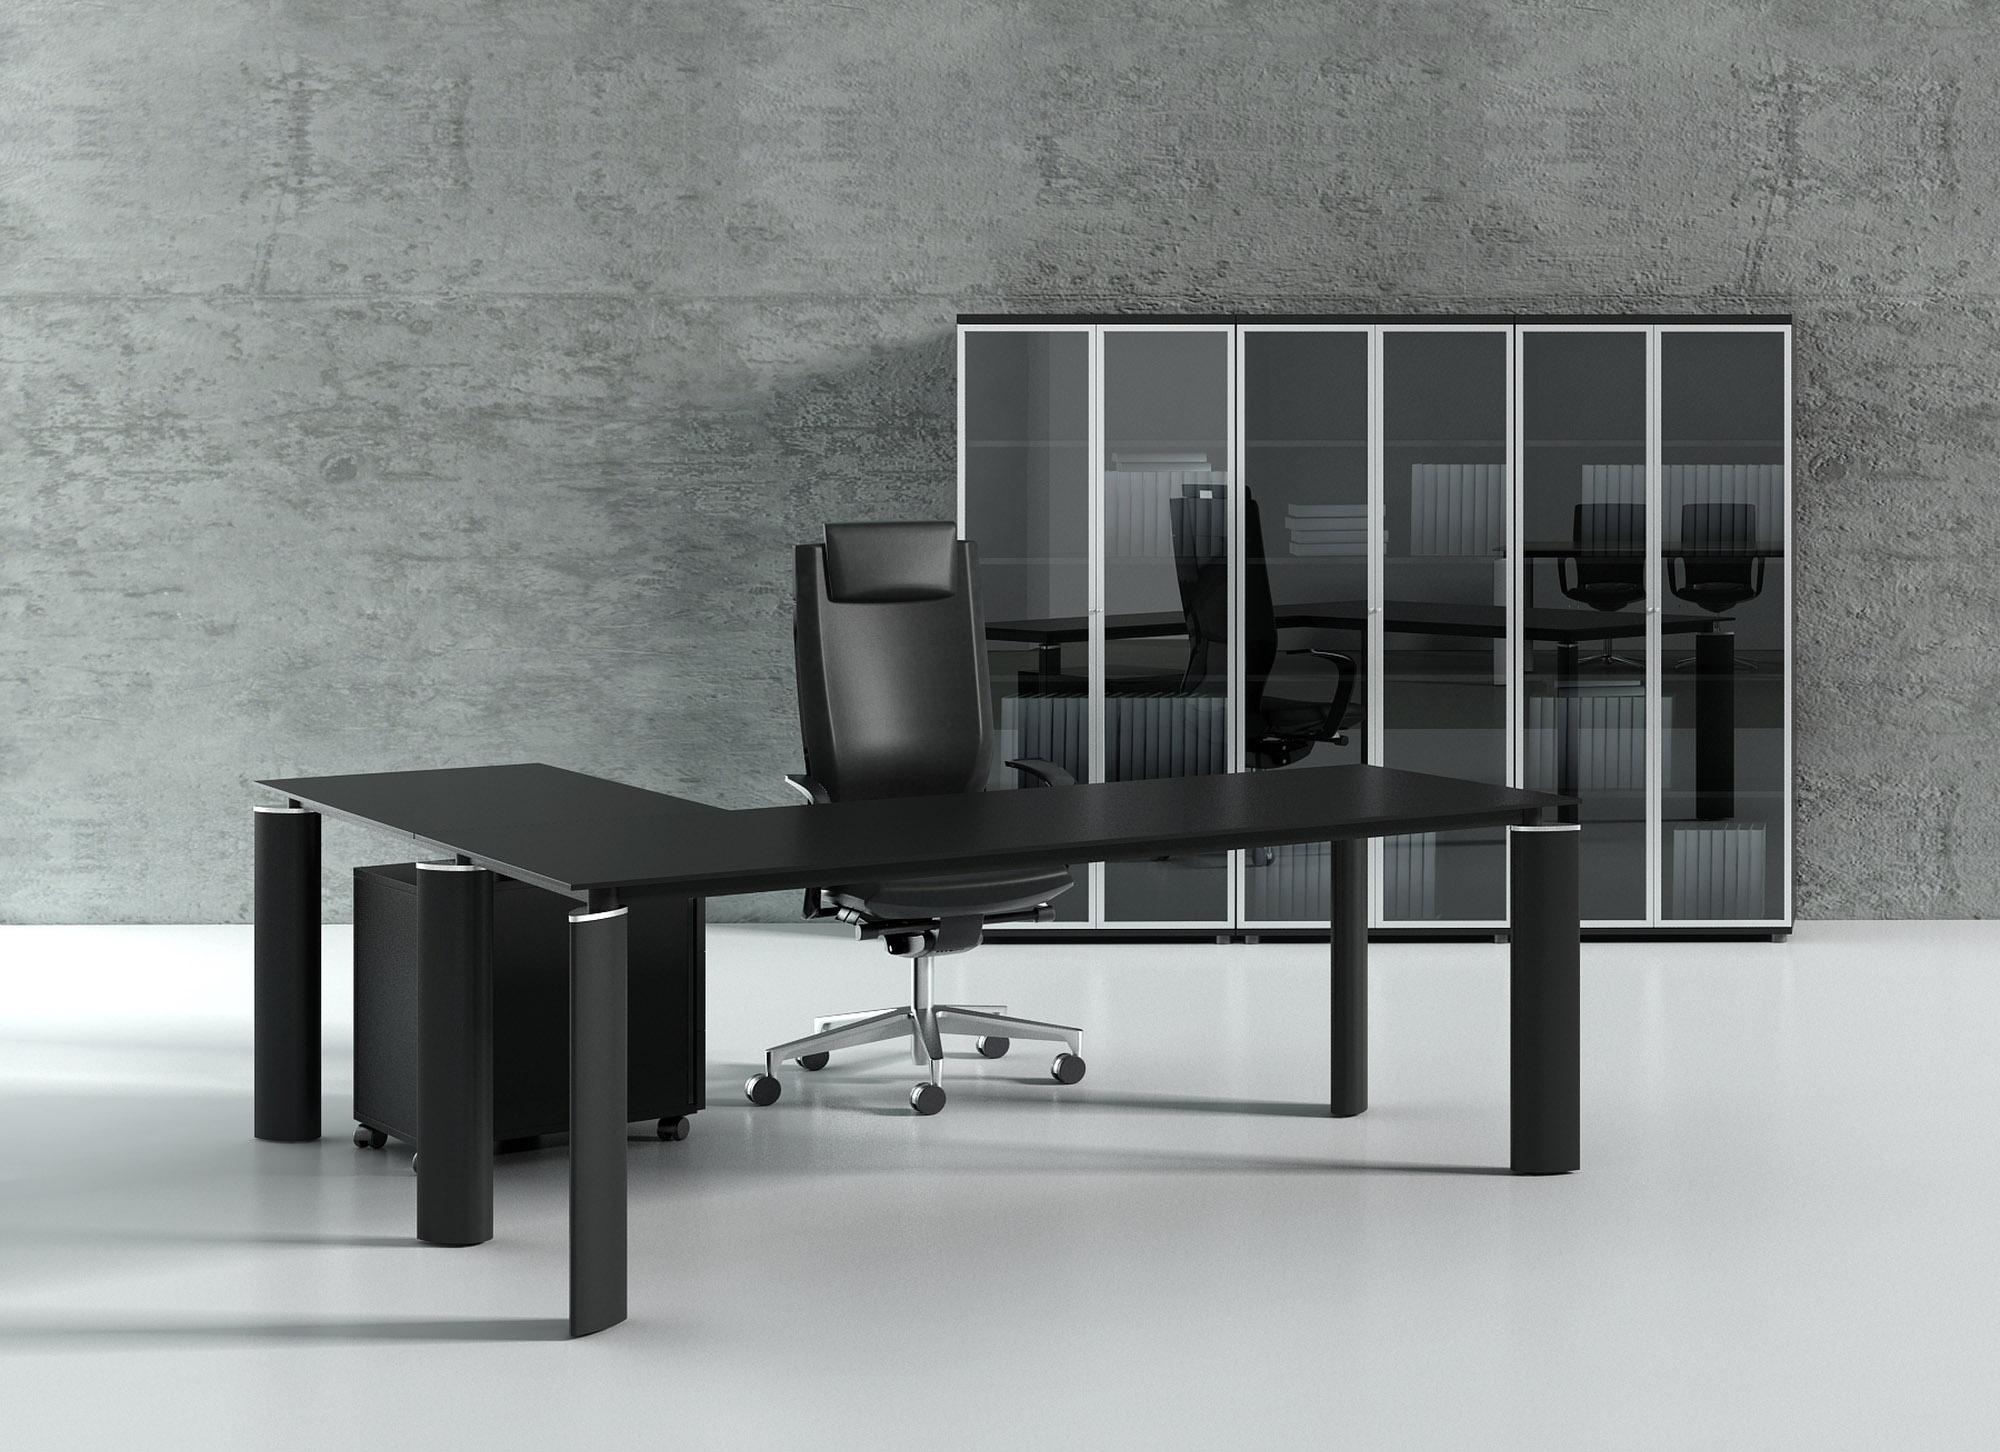 design winkel schreibtisch ancona glas b rom bel. Black Bedroom Furniture Sets. Home Design Ideas